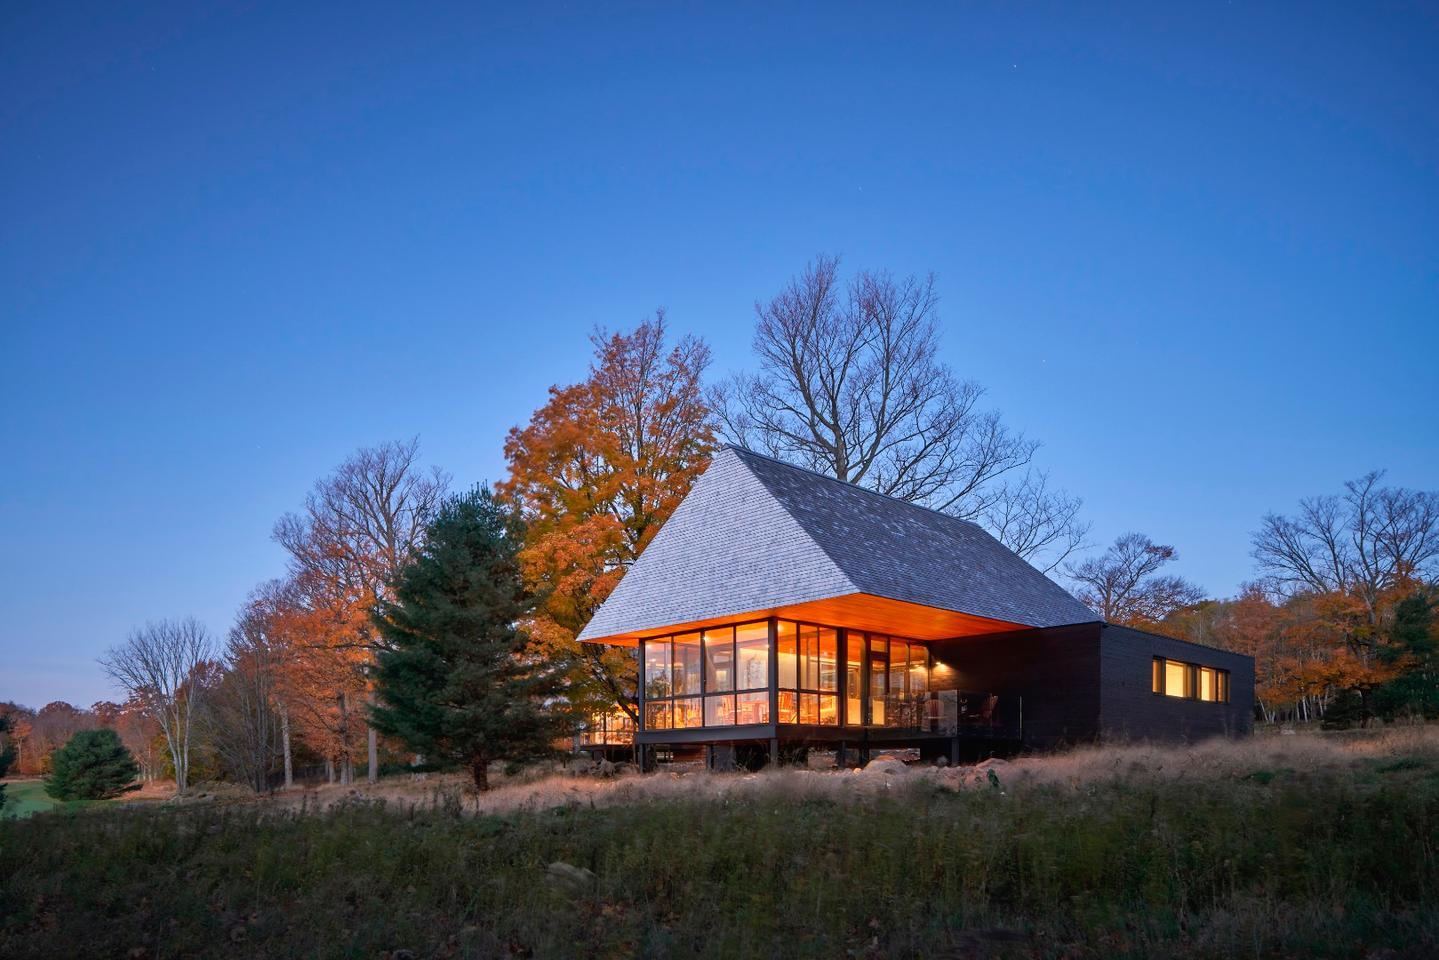 Bigwin Island Club Cabins was designed byMacKay-Lyons Sweetapple Architects